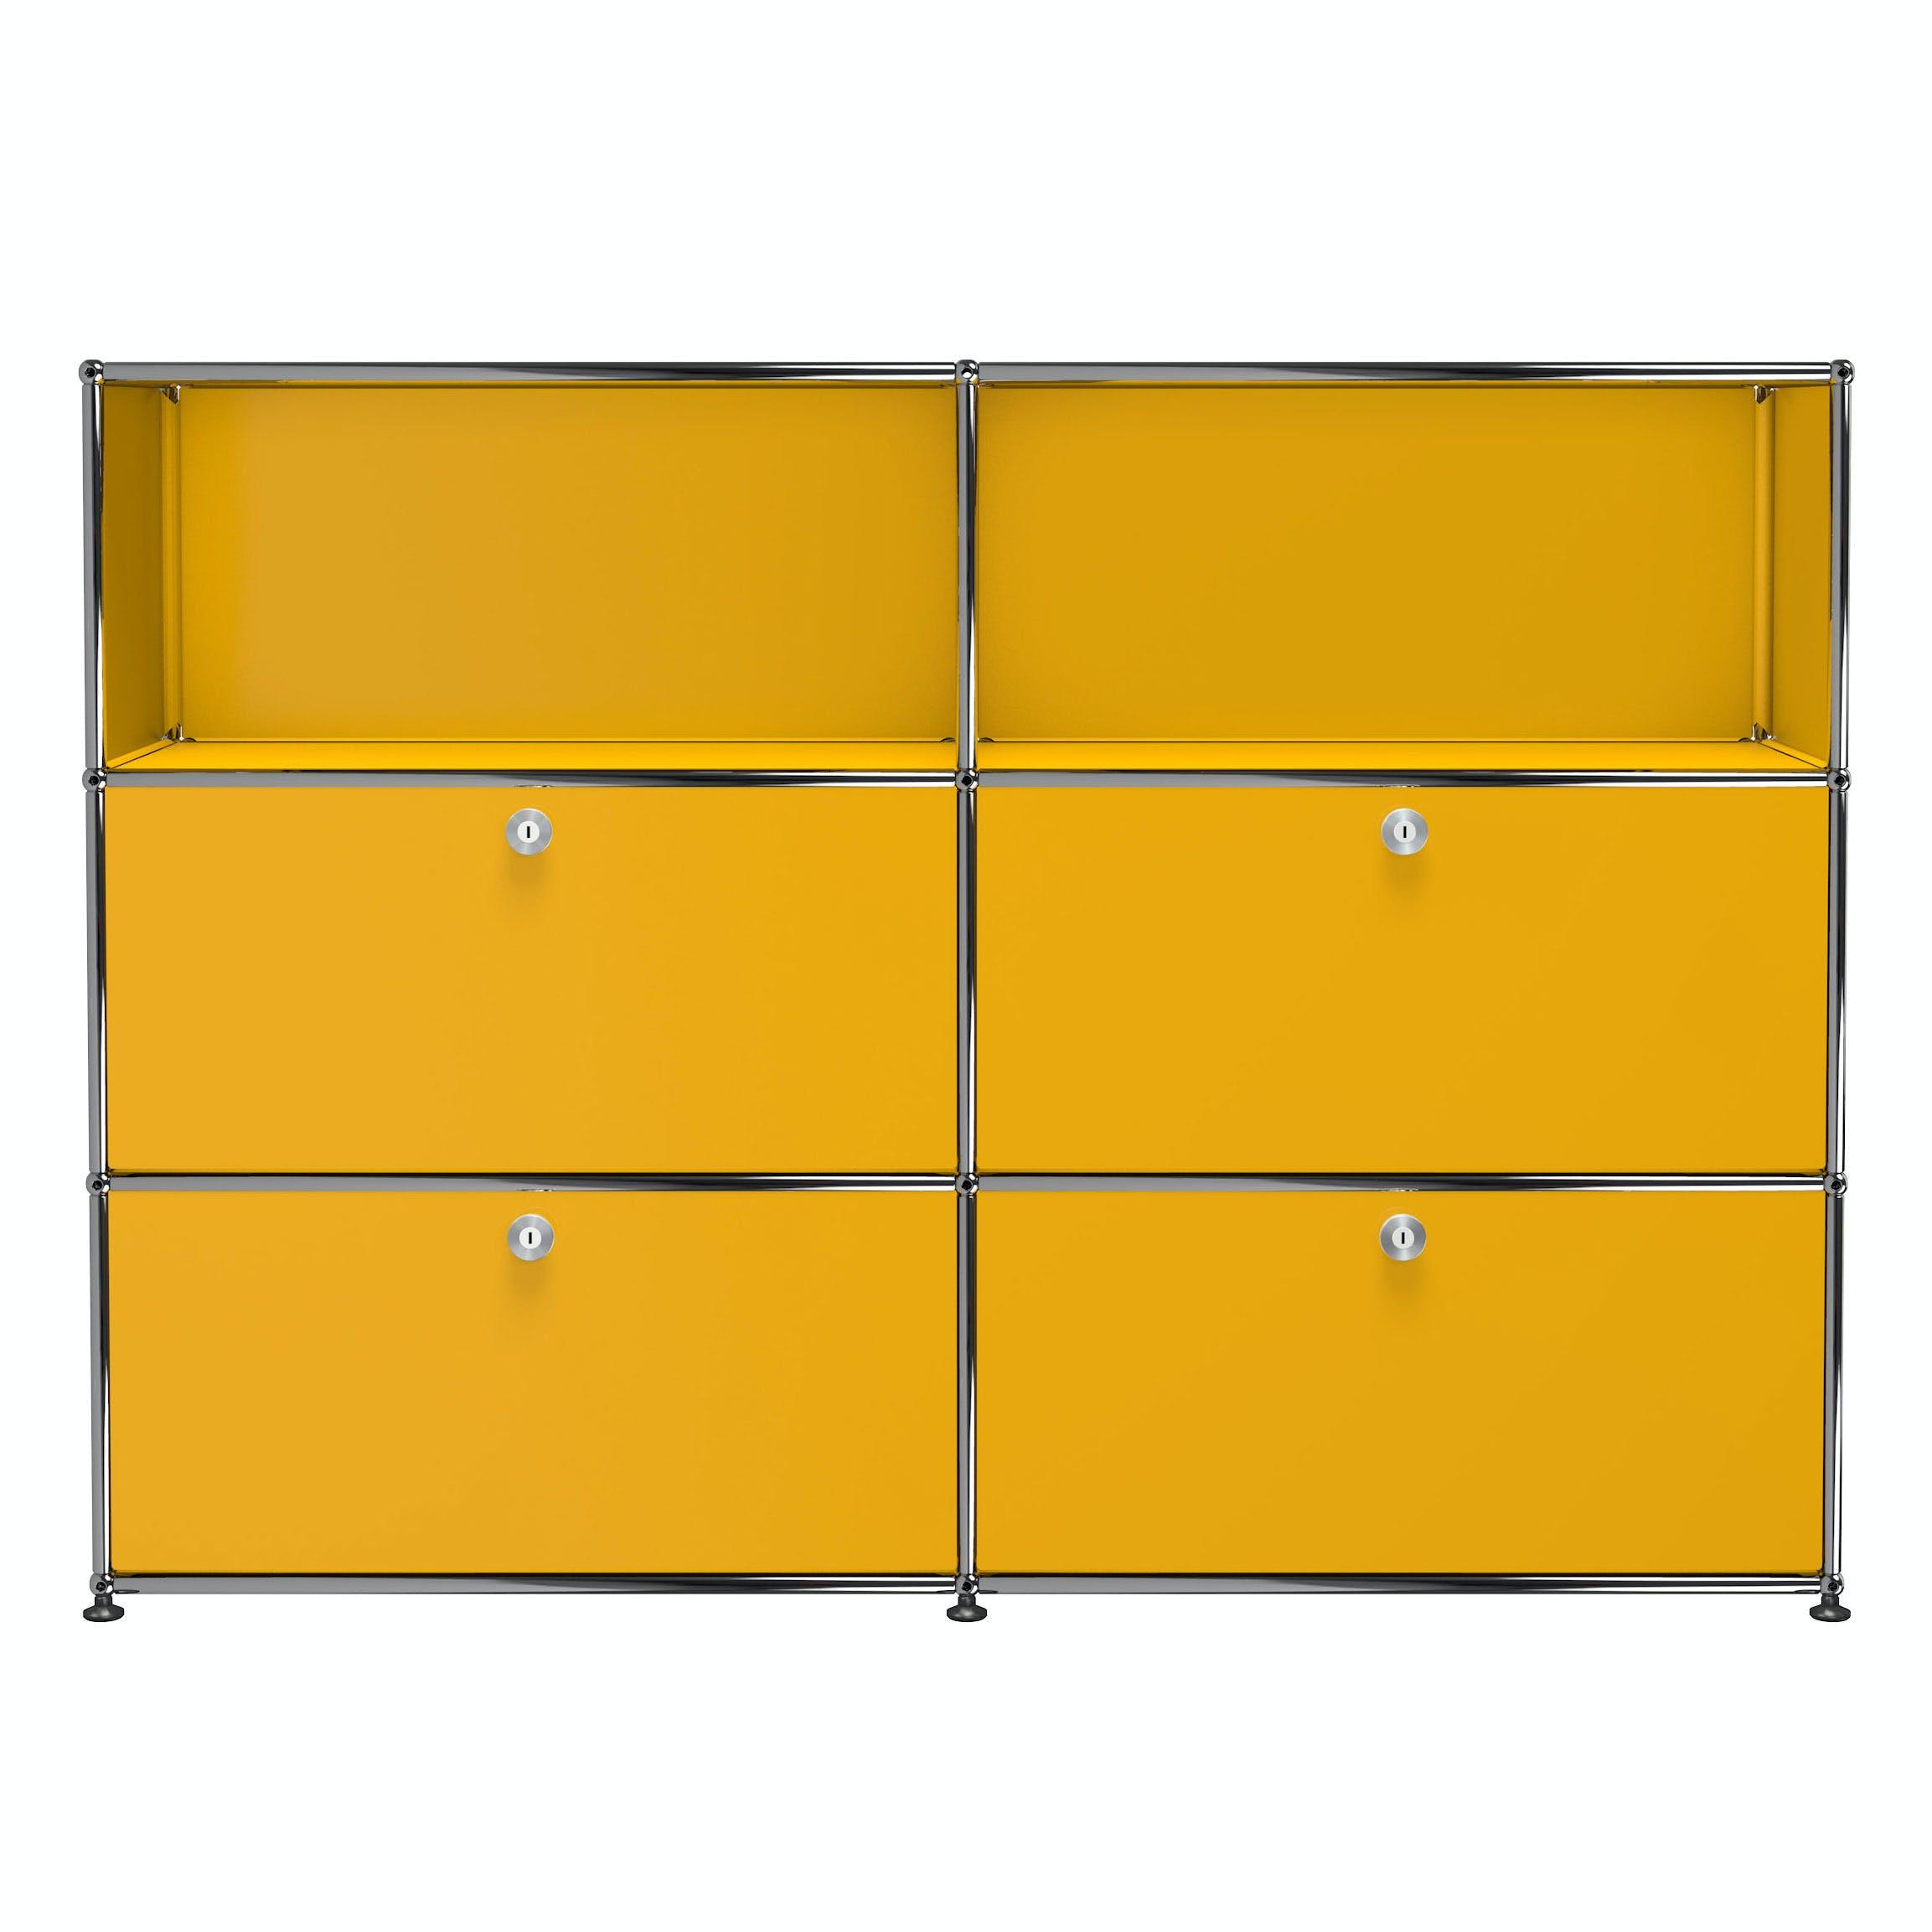 Usm-quick-shop-Haller-Storage-G2A-yellow-haute-living